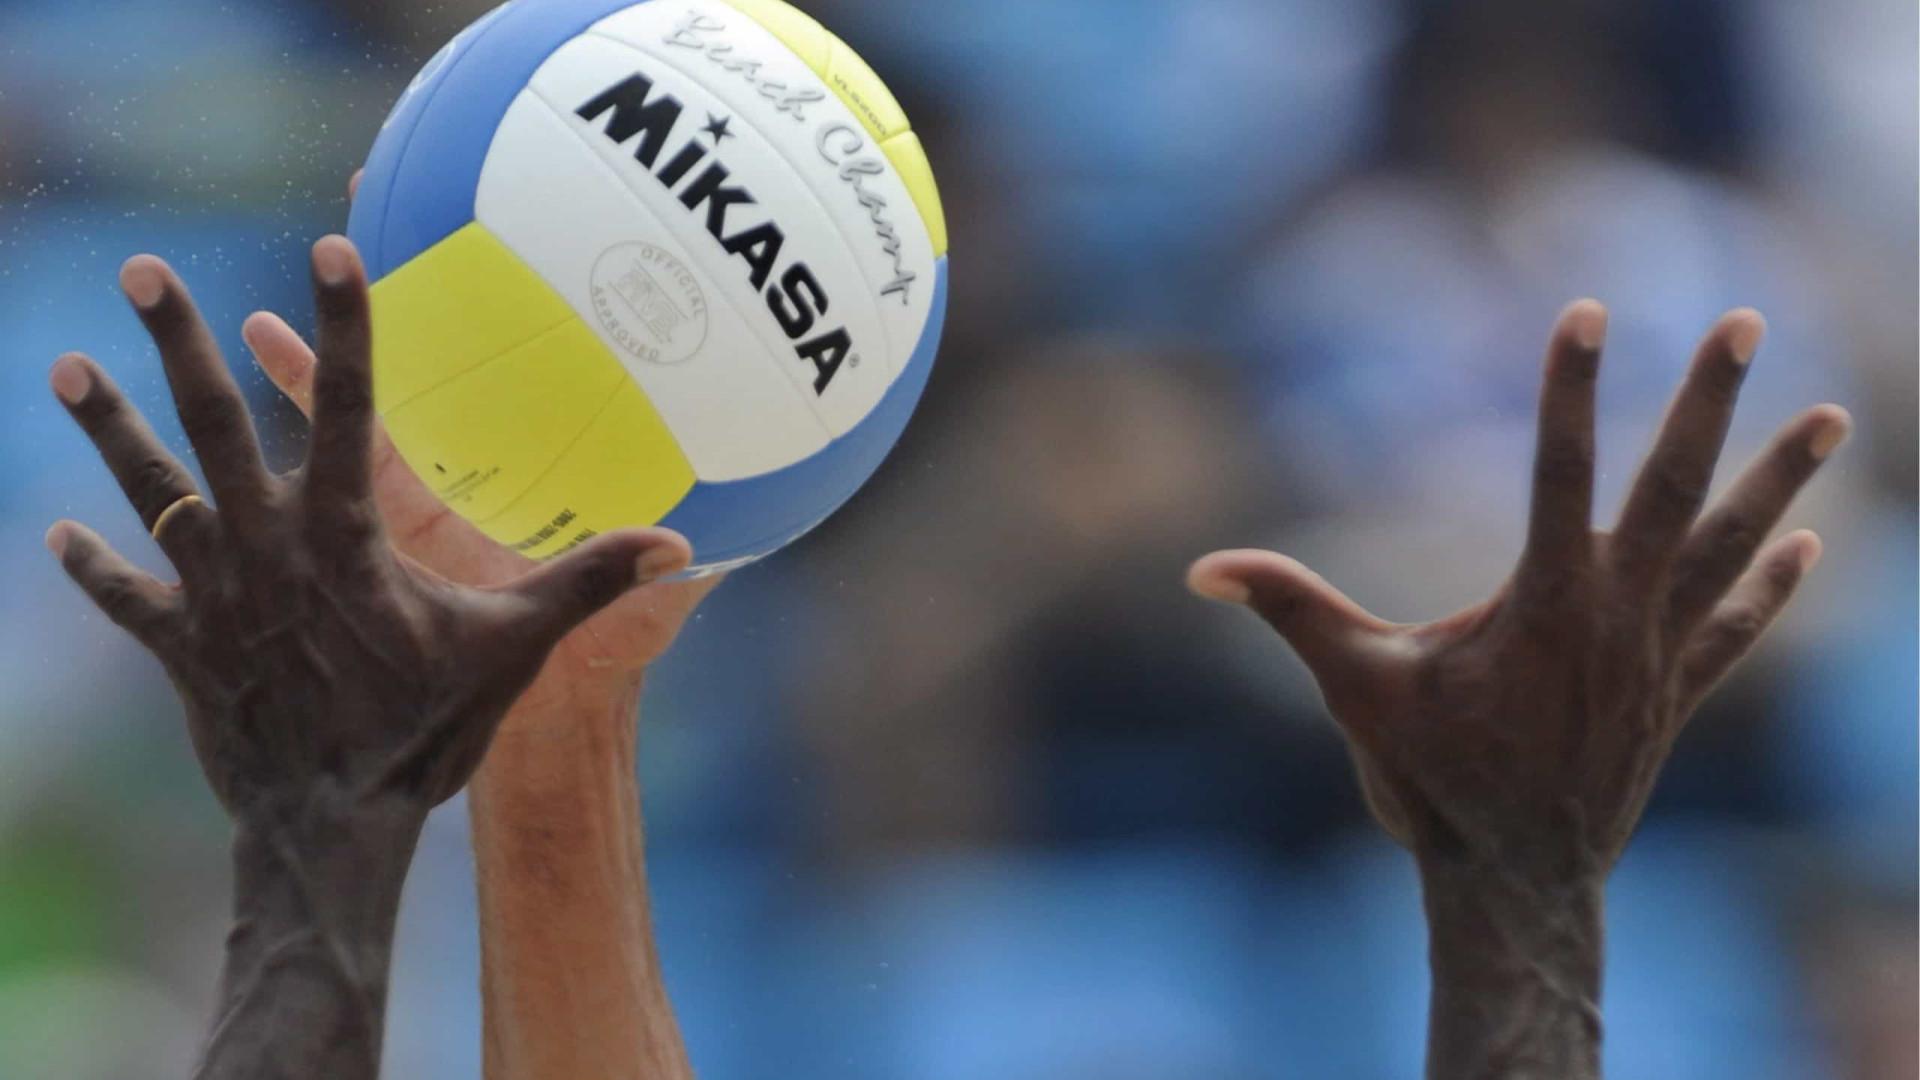 Europeu de voleibol de praia de sub-20 agendado para 9 a 13 de setembro